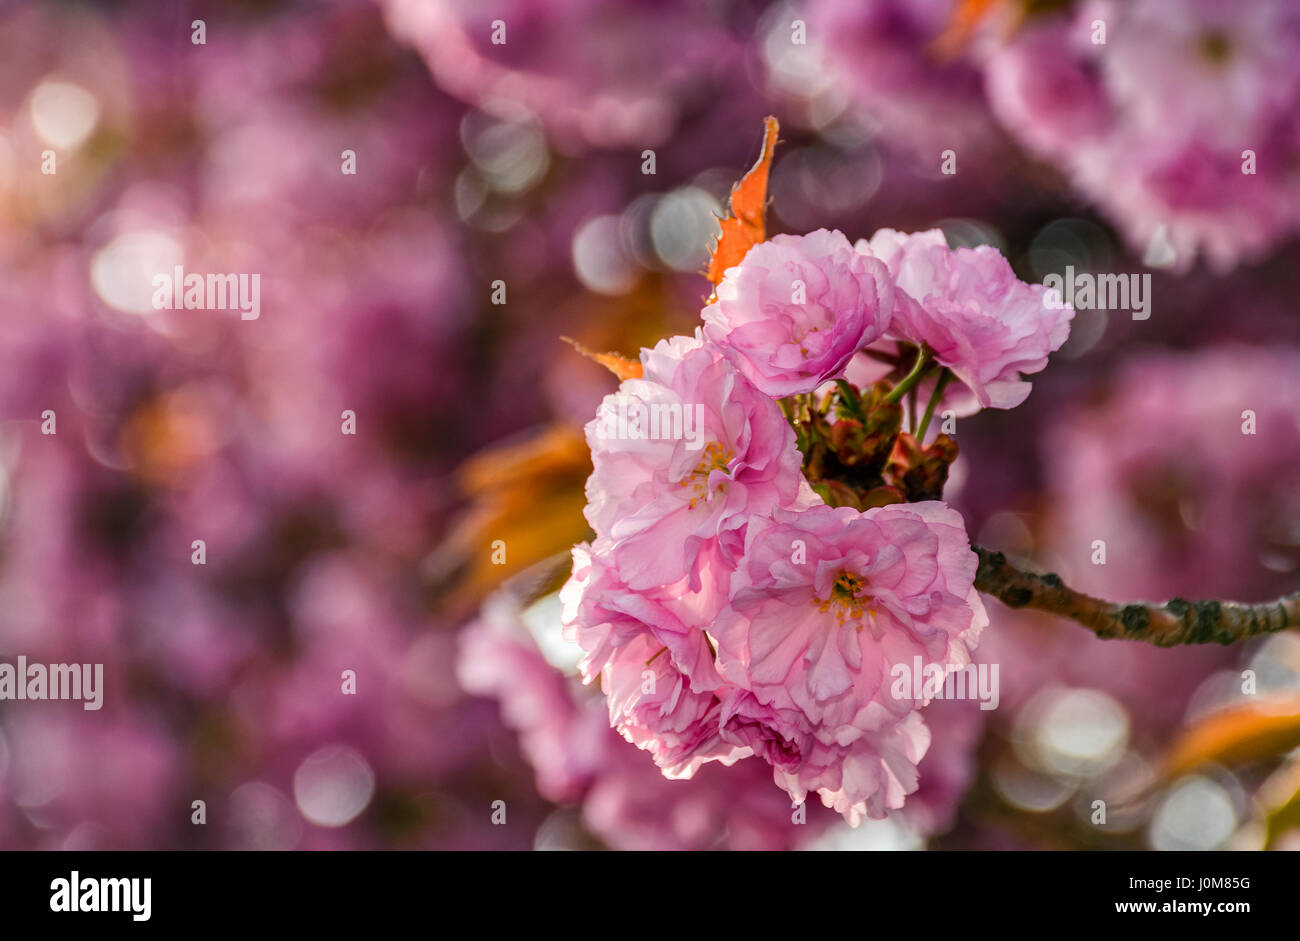 Beautiful spring background pink sakura flowers closeup on a stock photo beautiful spring background pink sakura flowers closeup on a branch blurred background of blossoming garden in springtime dhlflorist Images